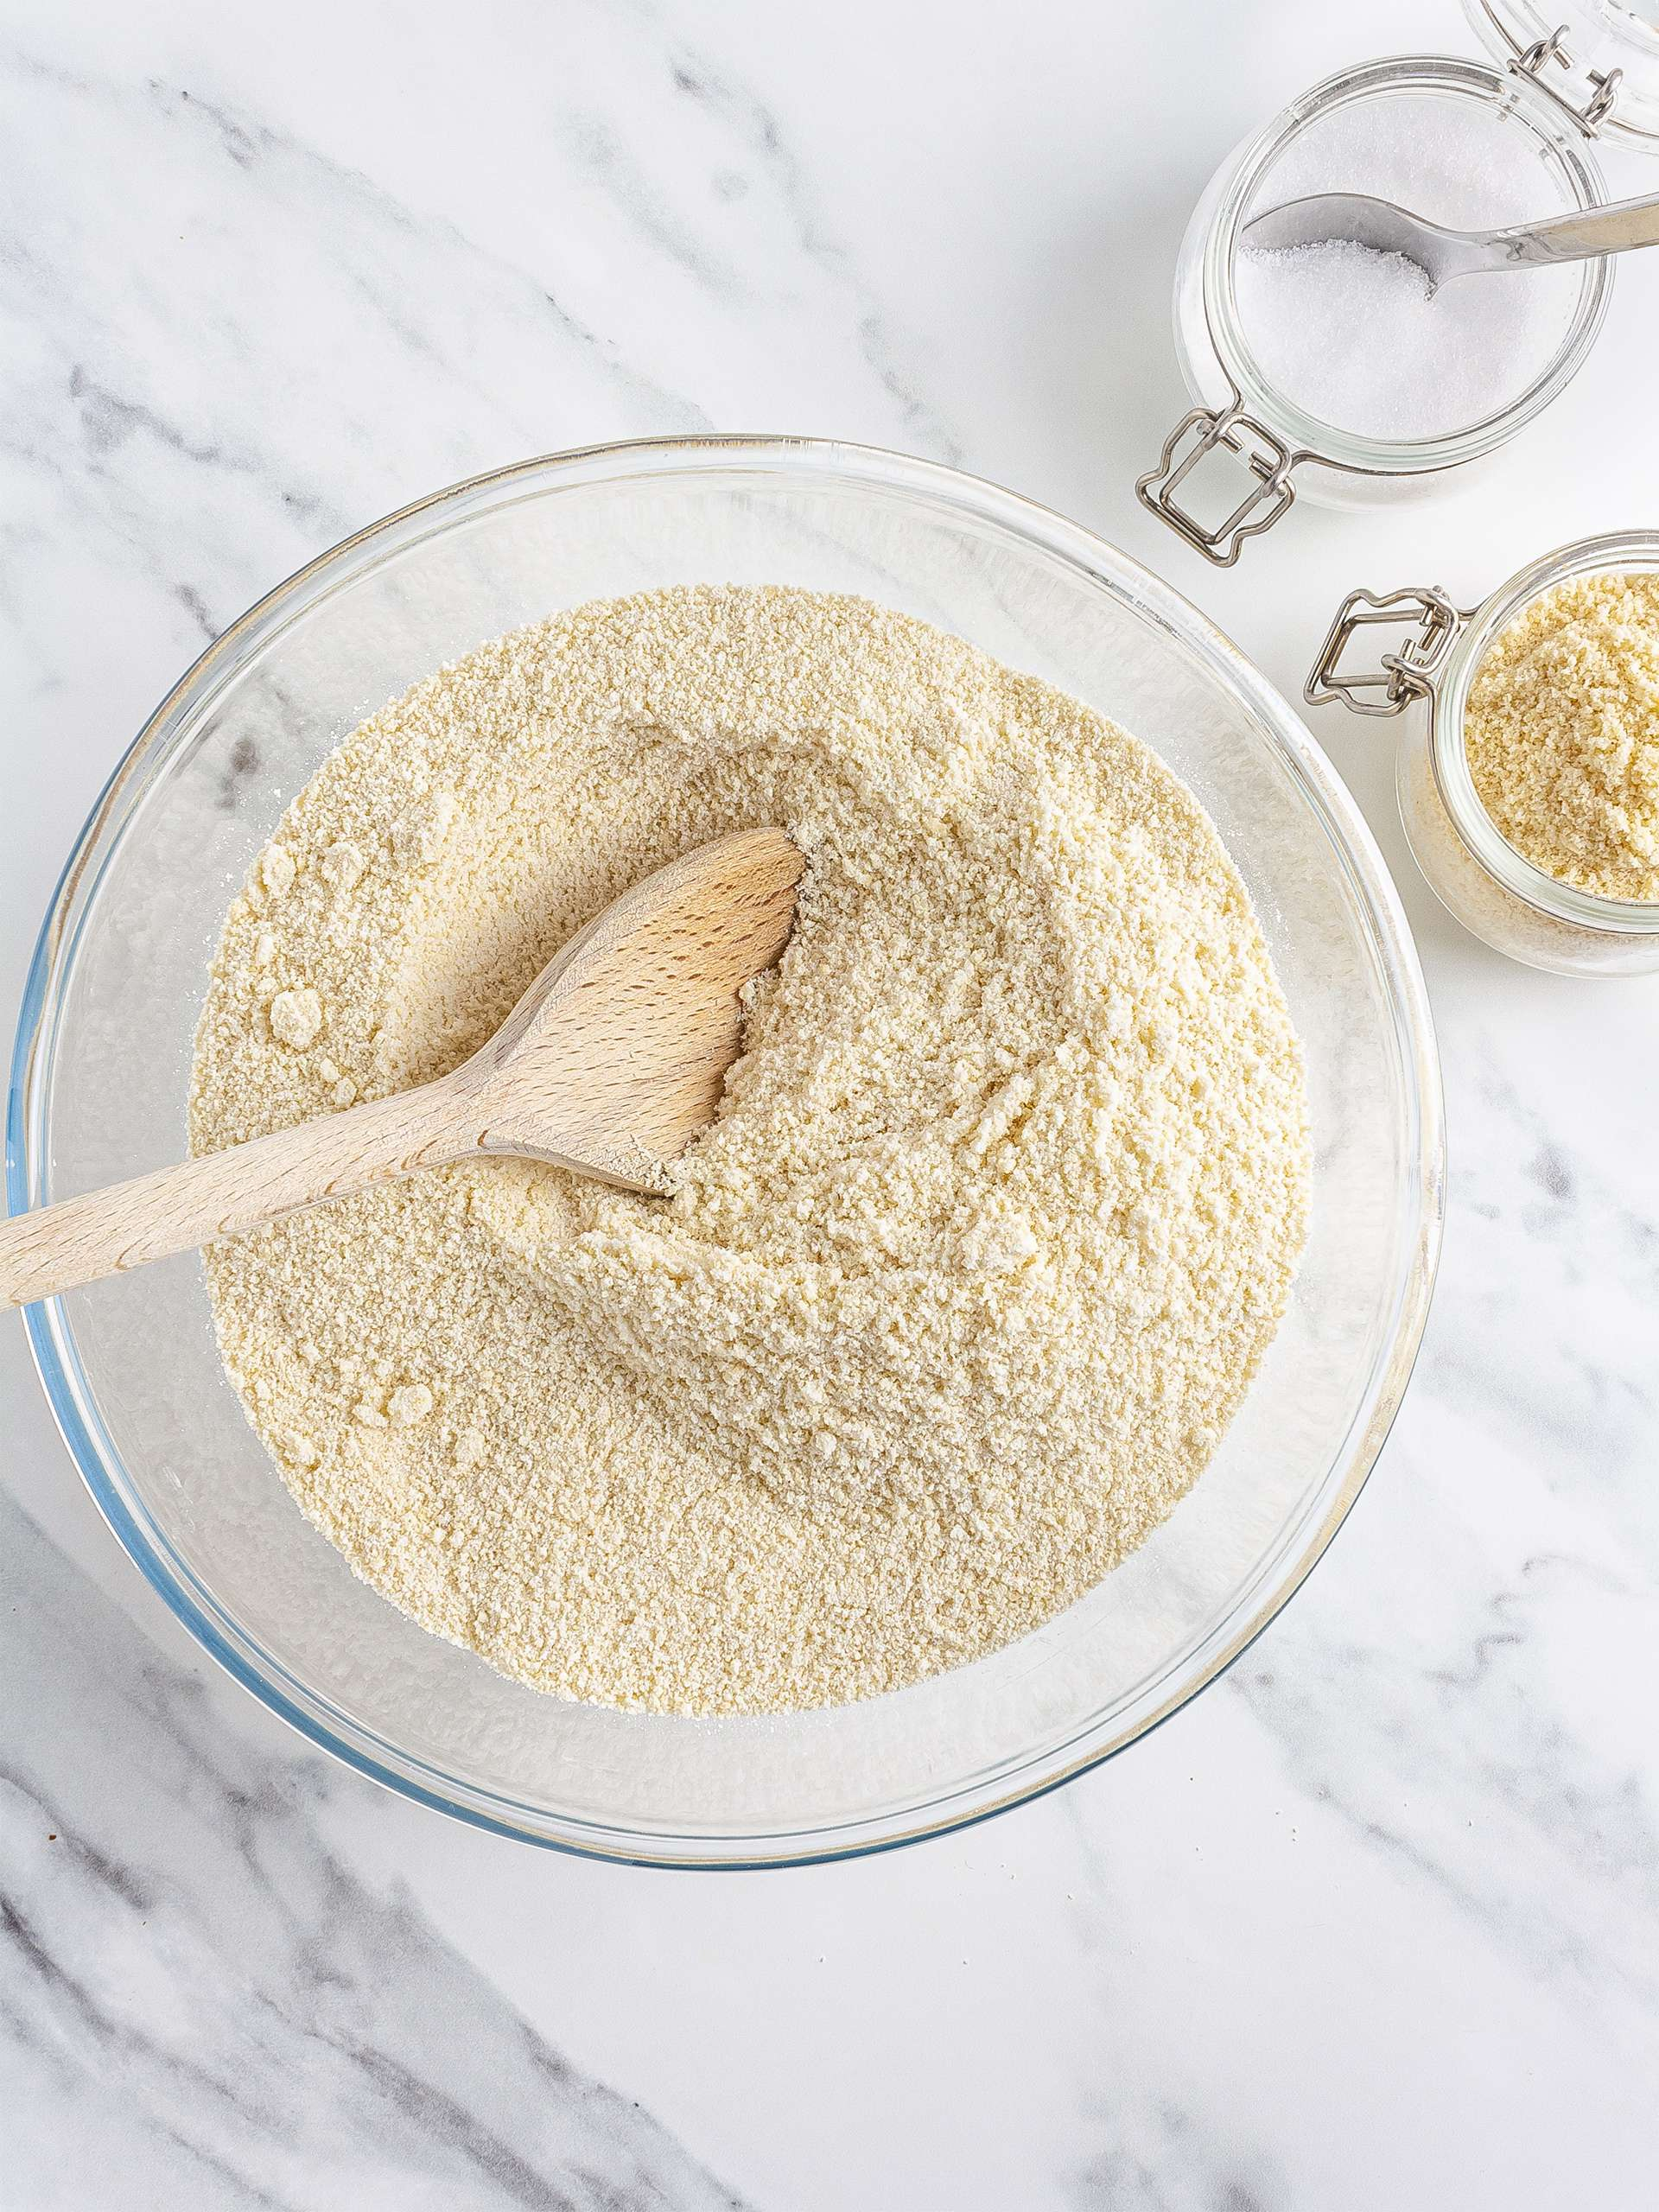 Almond flour with erythritol